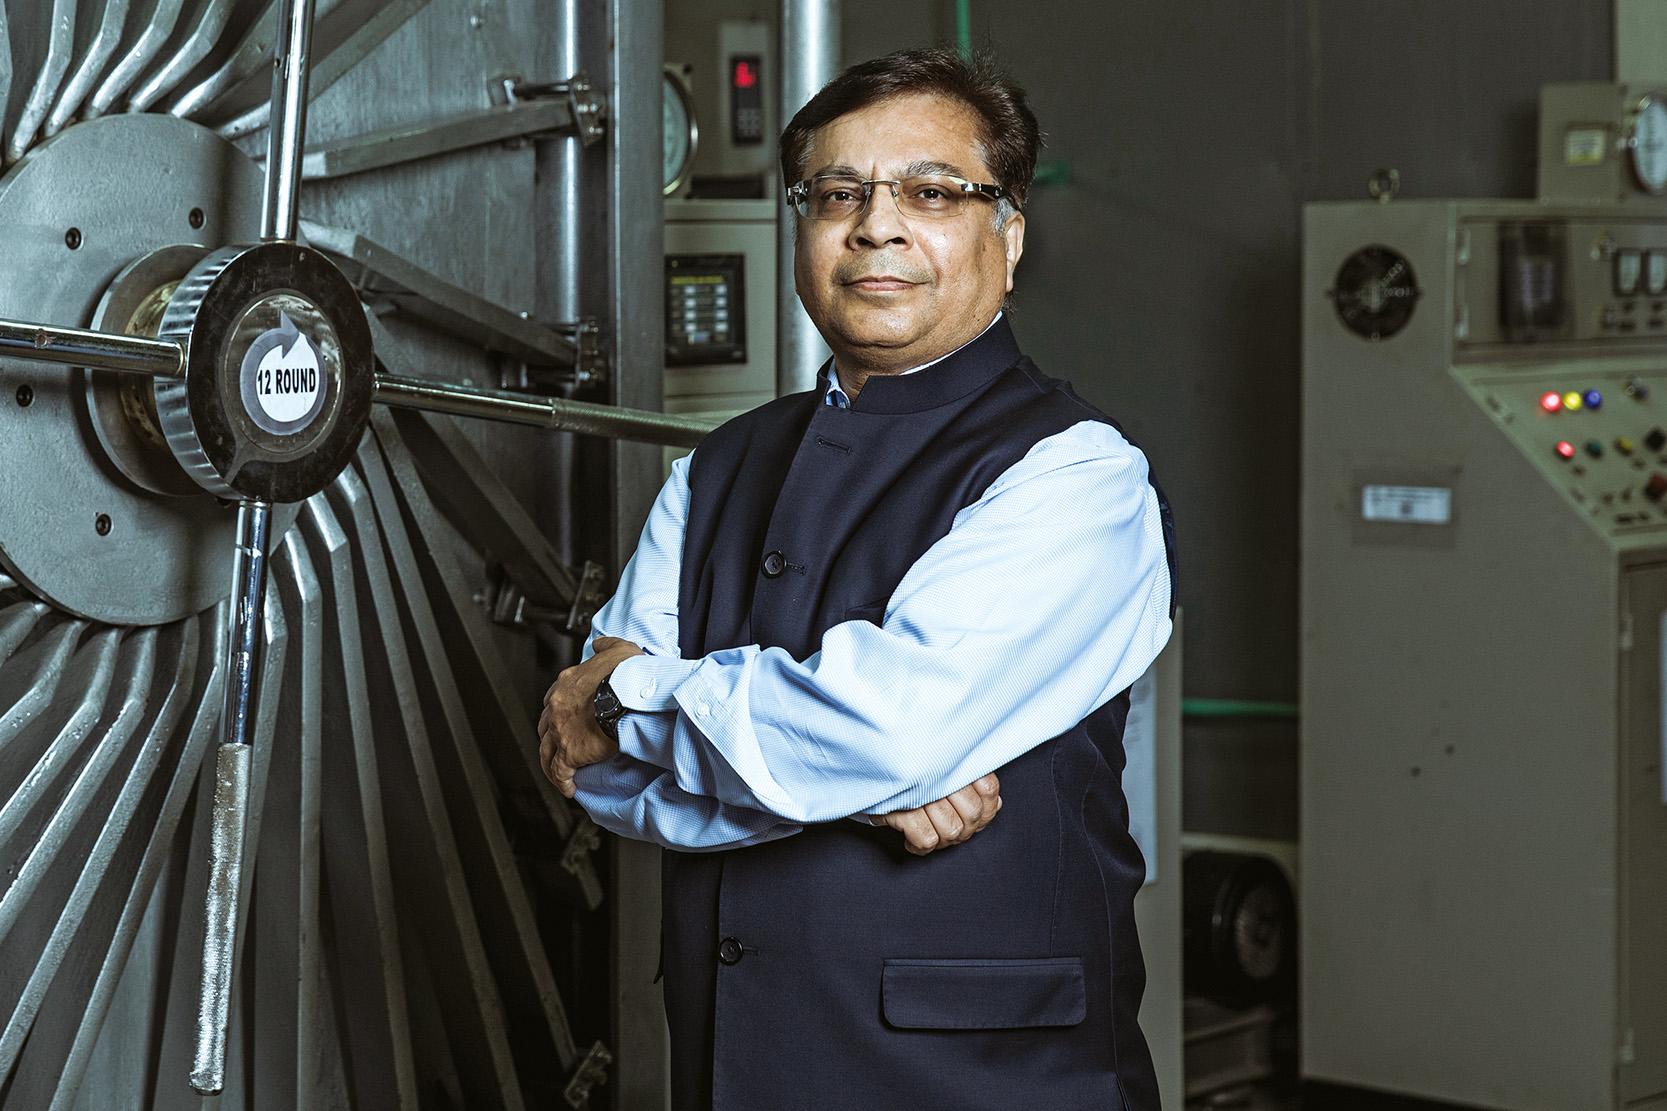 Rajiv Nath, Managing Director of Hindustan Syringes & Medical Devices